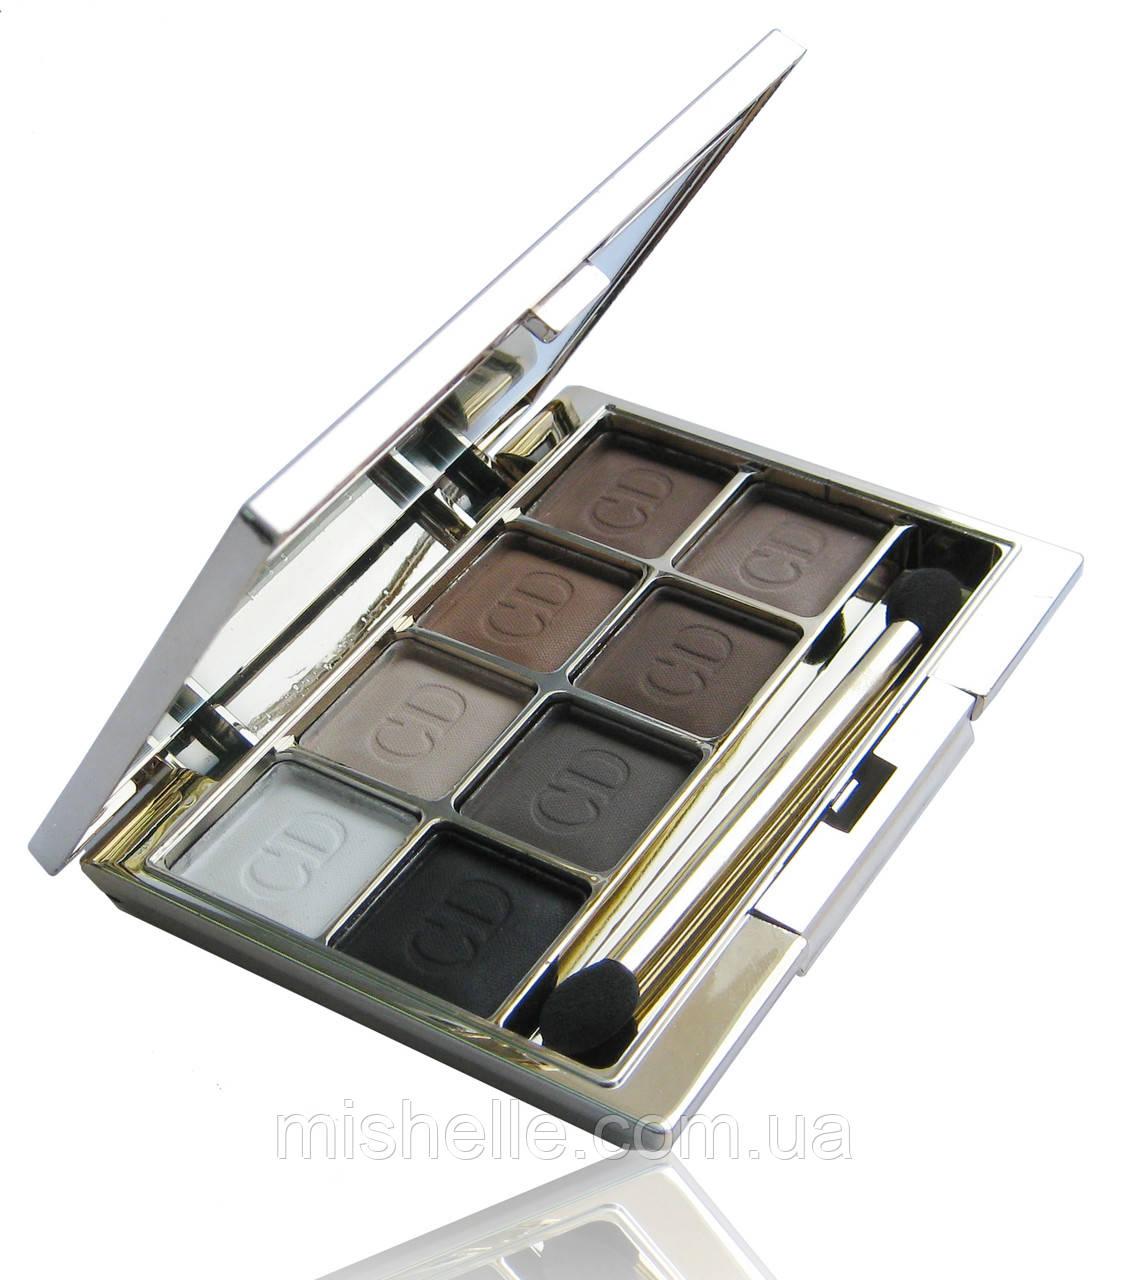 Тени Dior Natural Three-Dimensional (Диор Натурель Дименшионал)